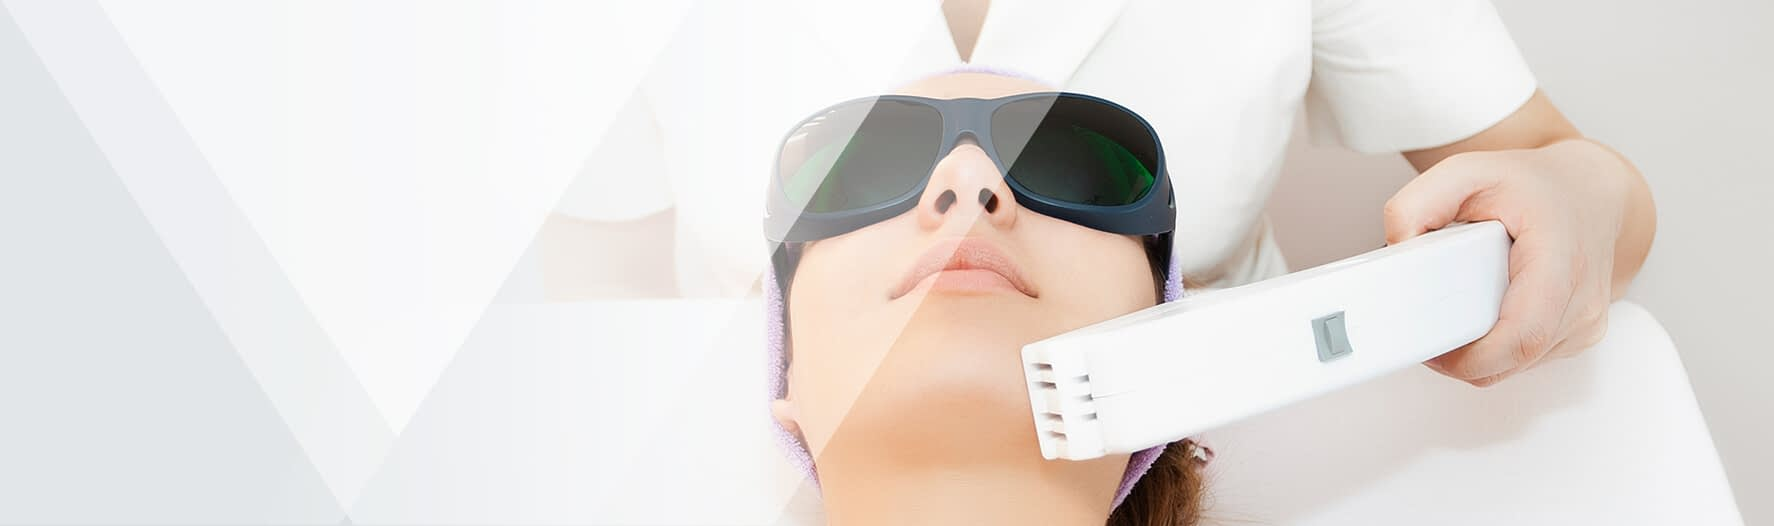 Dermatólogo Pilar Torres - Terapia láser